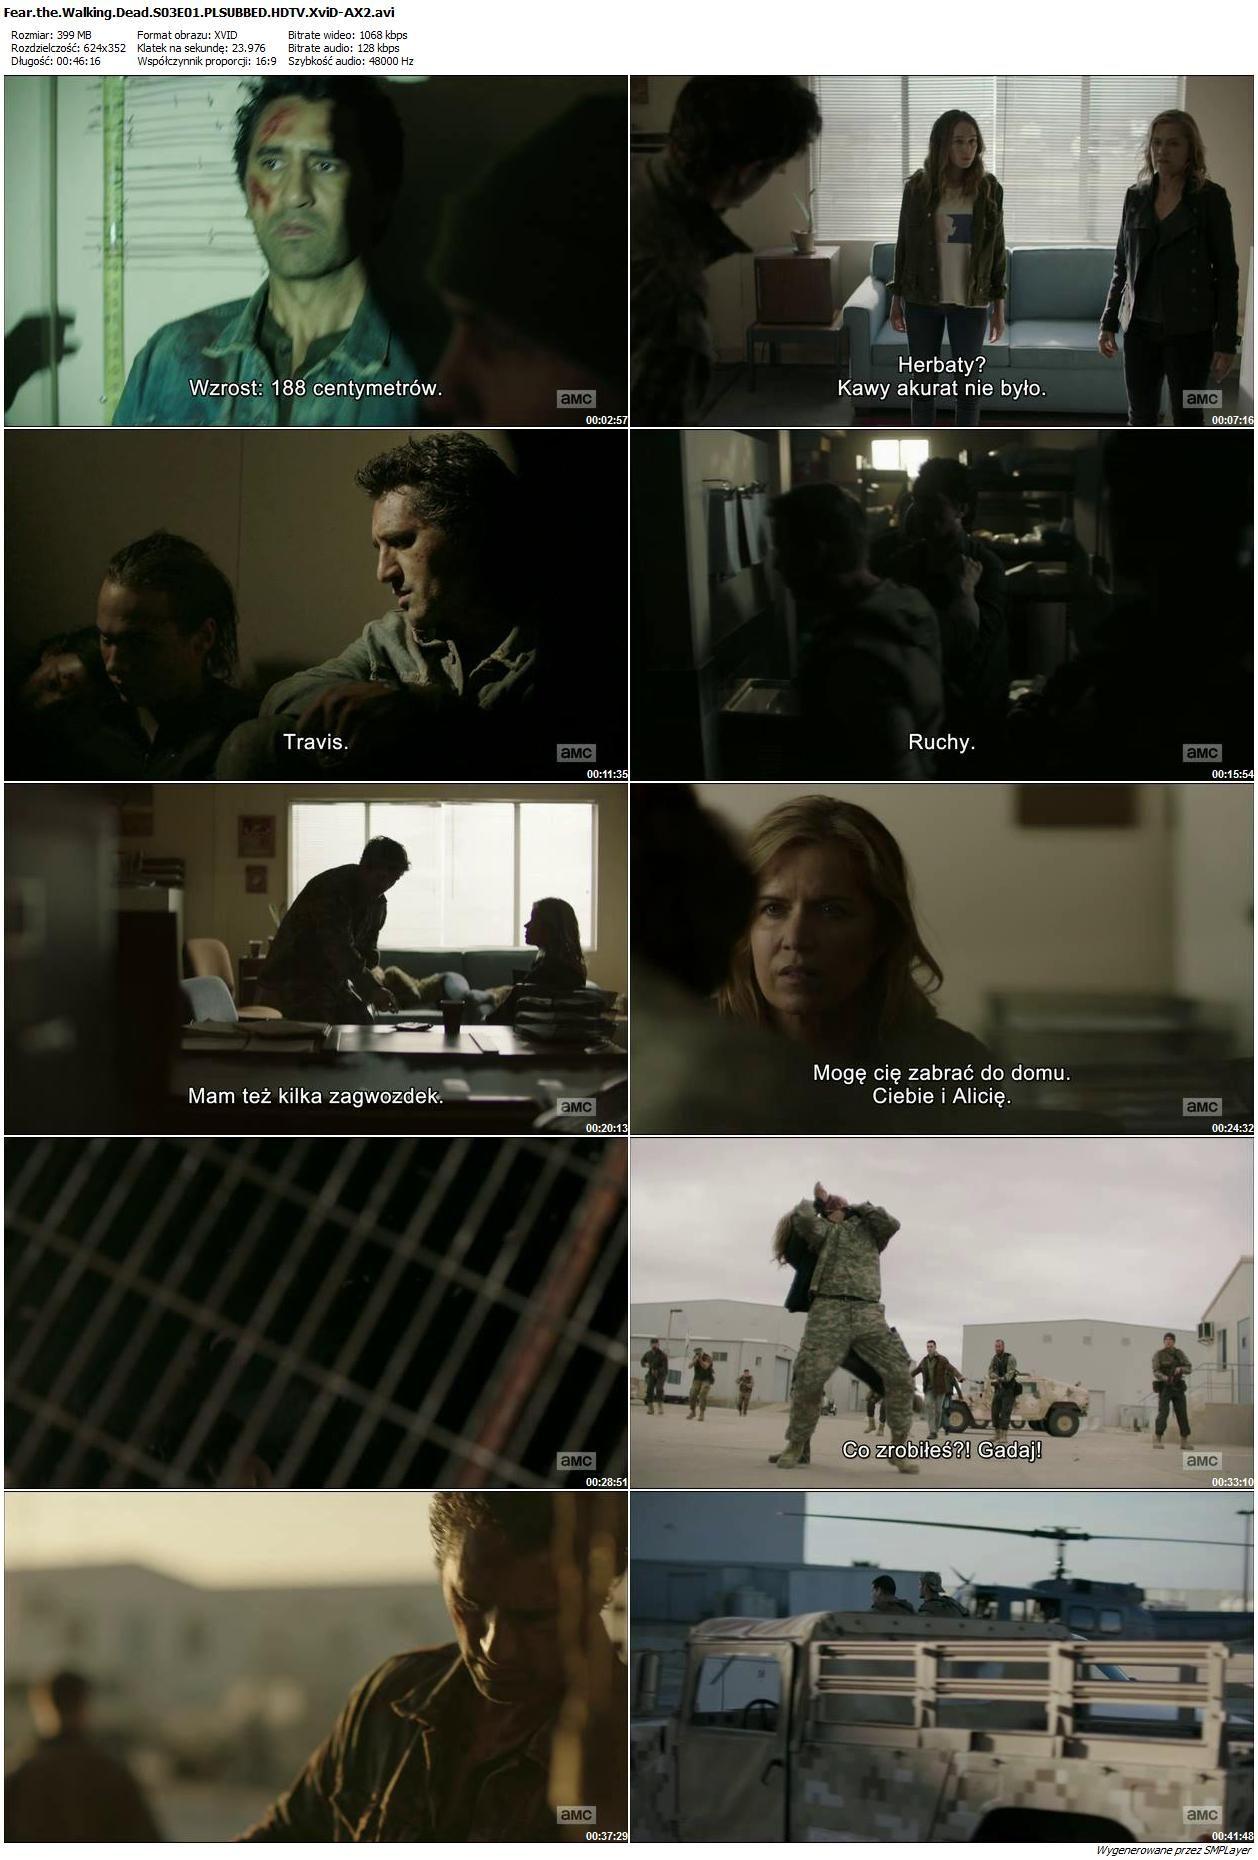 Fear the Walking Dead {Sezon 03} (2017) PLSUBBED.HDTV.XviD-AX2 / WTOPIONE NAPISY PL